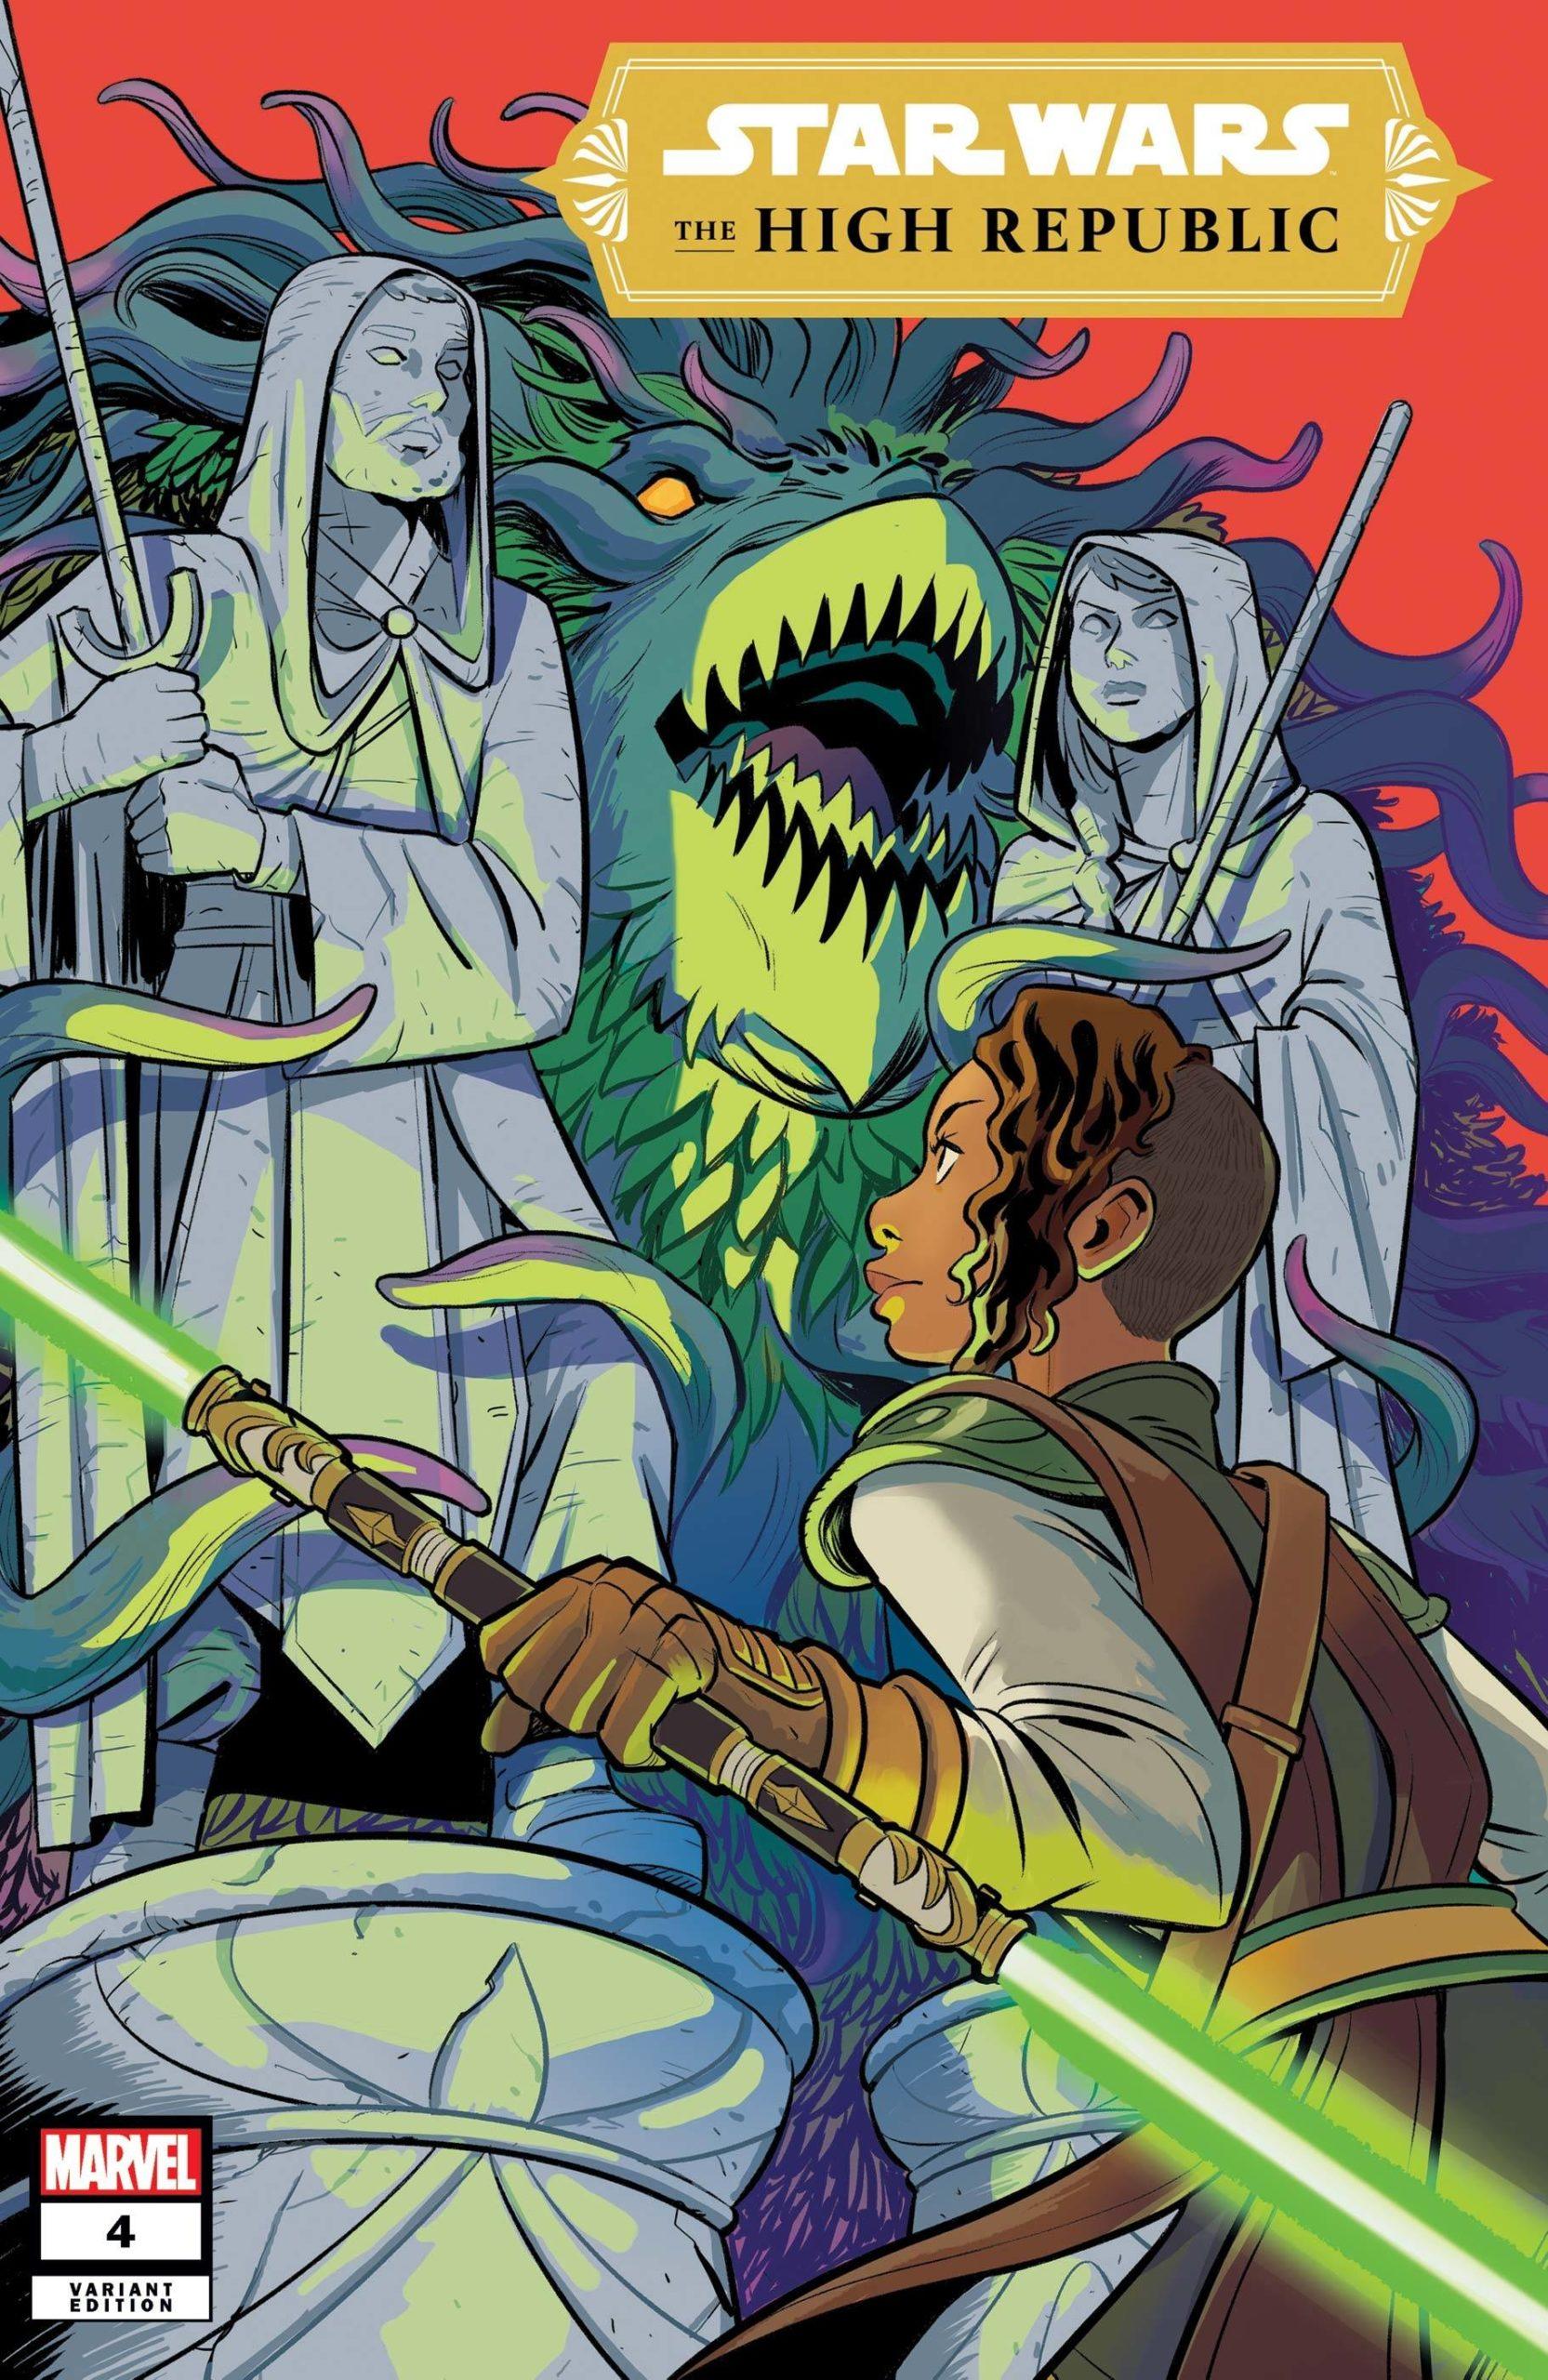 The High Republic #4 (Natacha Bustos Variant Cover) (07.04.2021)